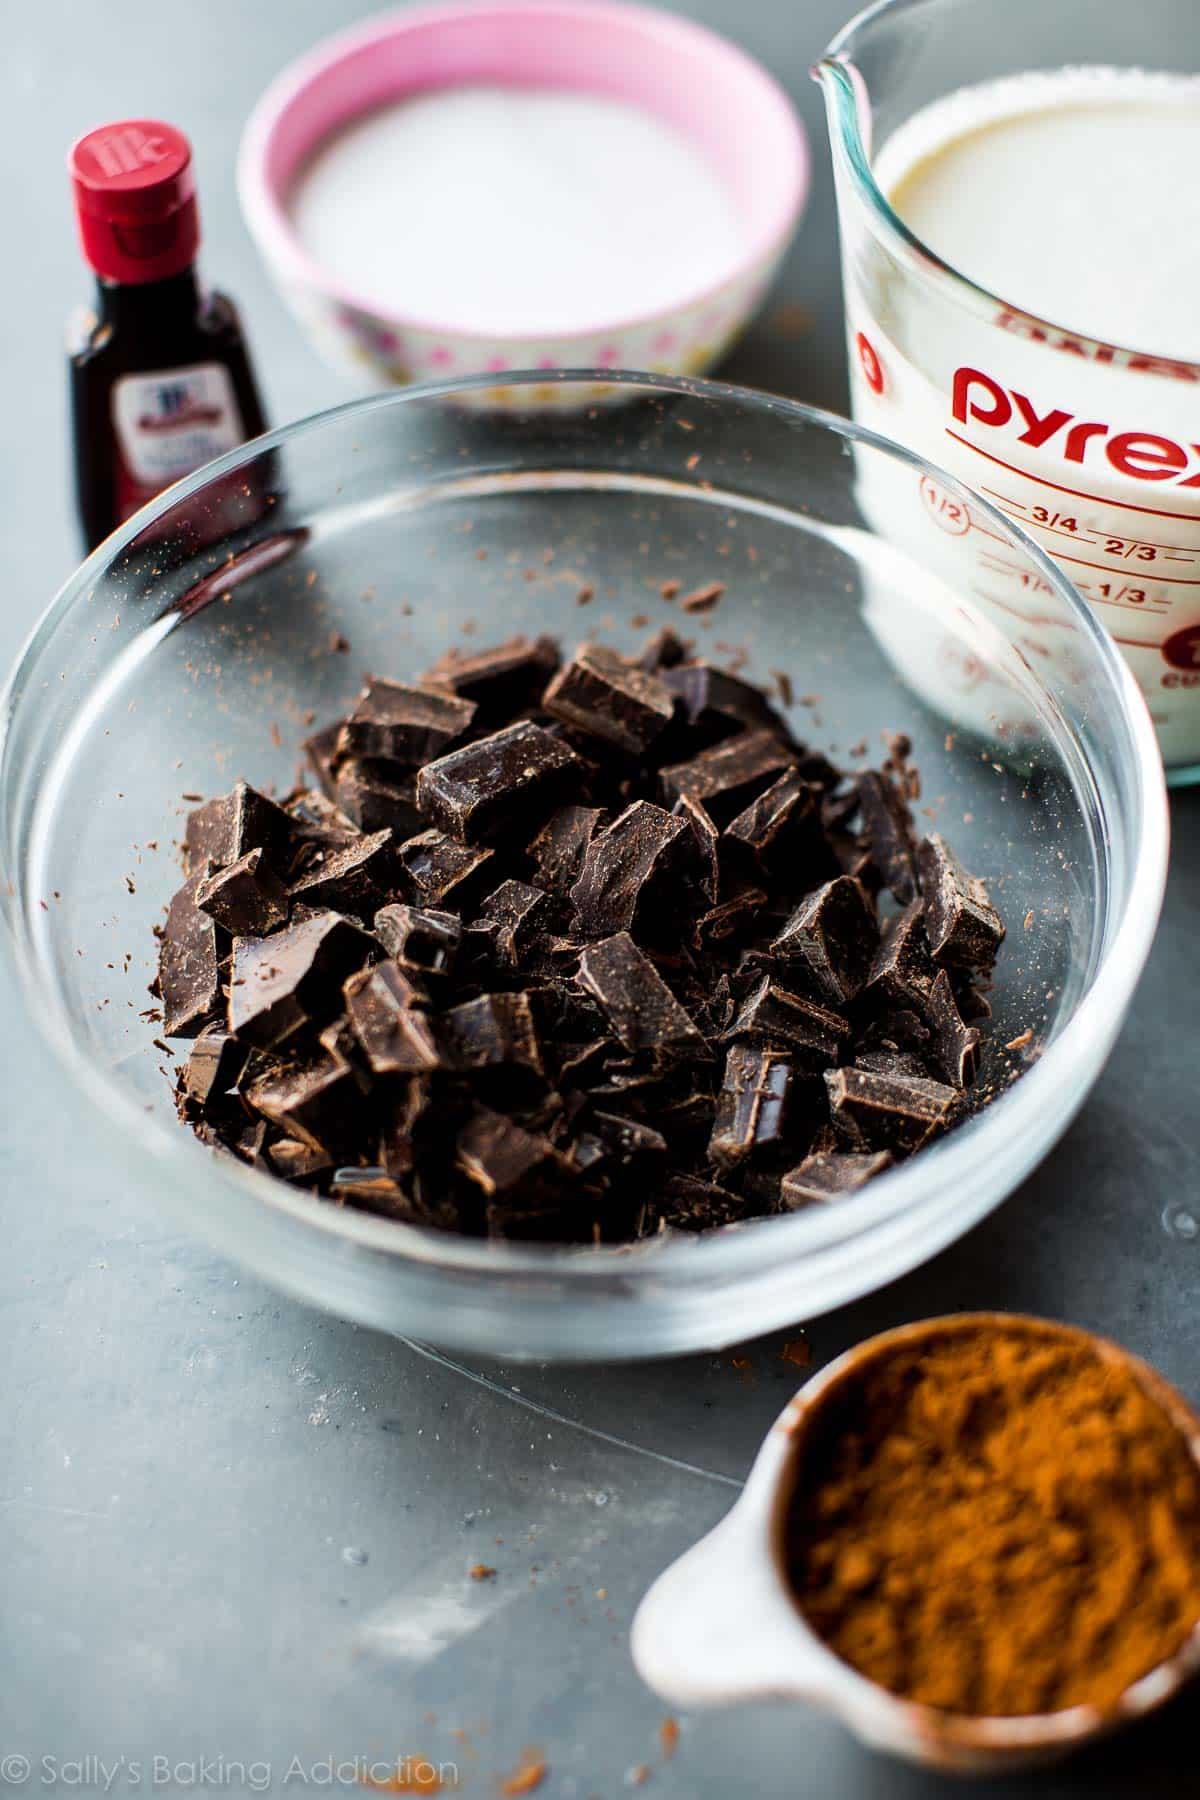 Decadent Slow Cooker Hot Chocolate - Sallys Baking Addiction